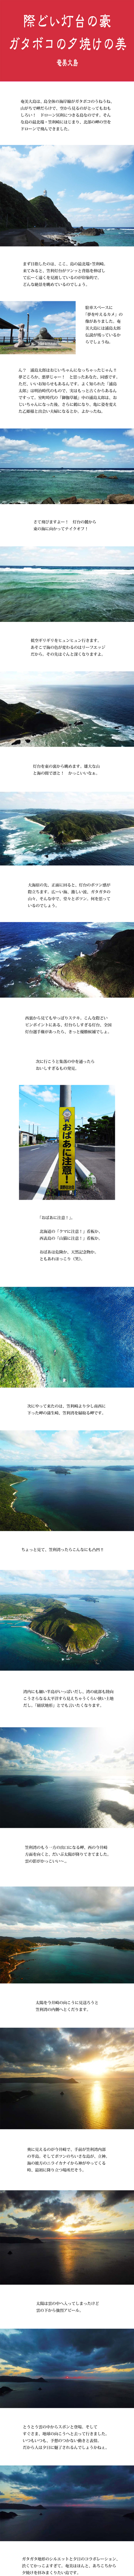 tomako180725.jpg